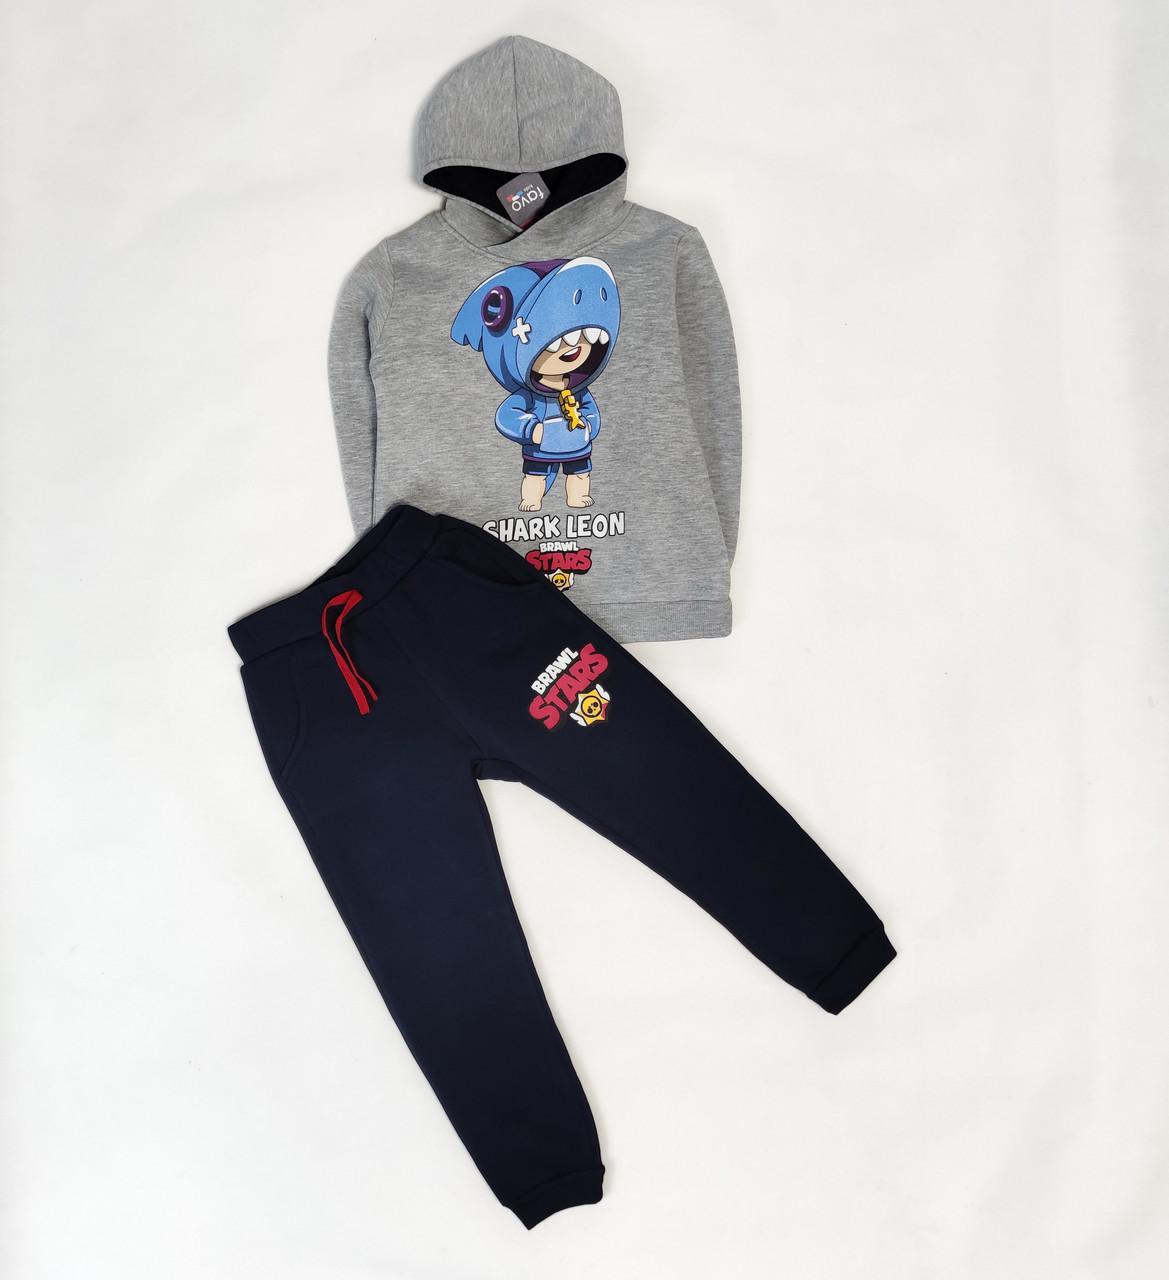 Бравл Старс brawl stars утепленный теплый костюм для мальчика кофта реглан штаны серый 6-7 лет